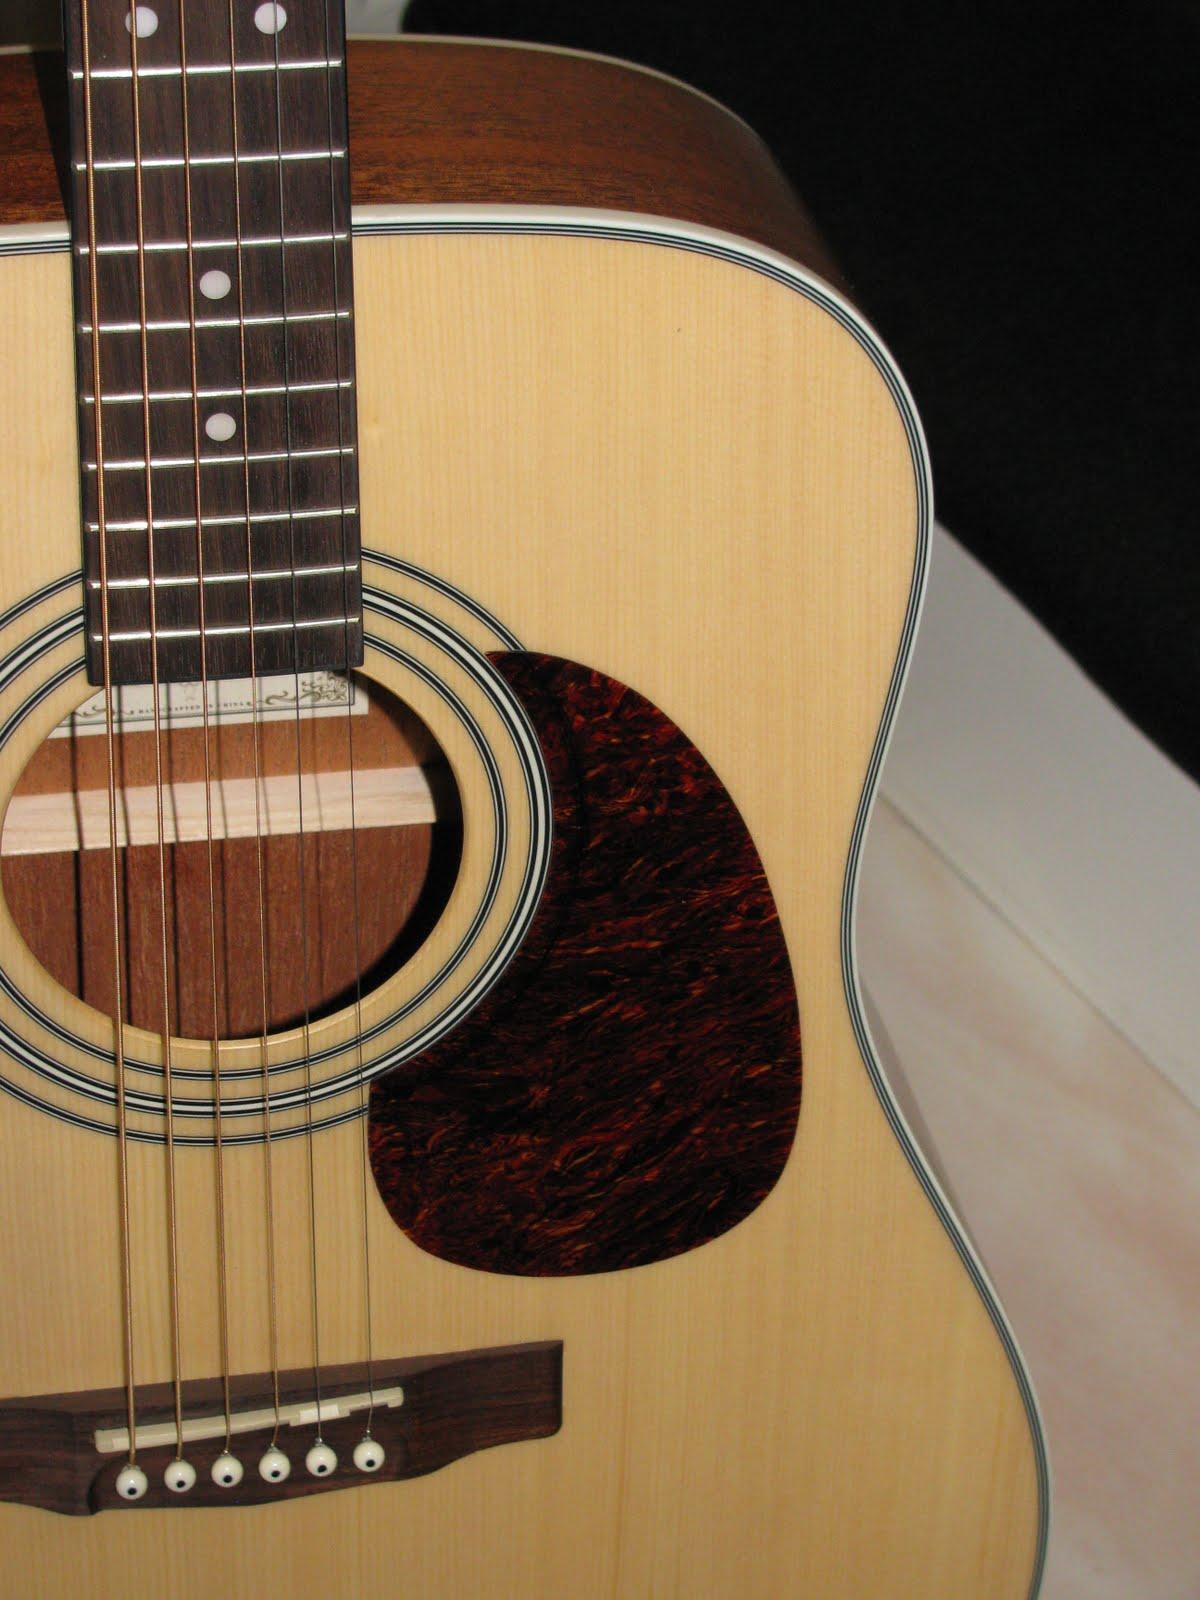 belgiumbarb guitars teenagers and brad paisley. Black Bedroom Furniture Sets. Home Design Ideas